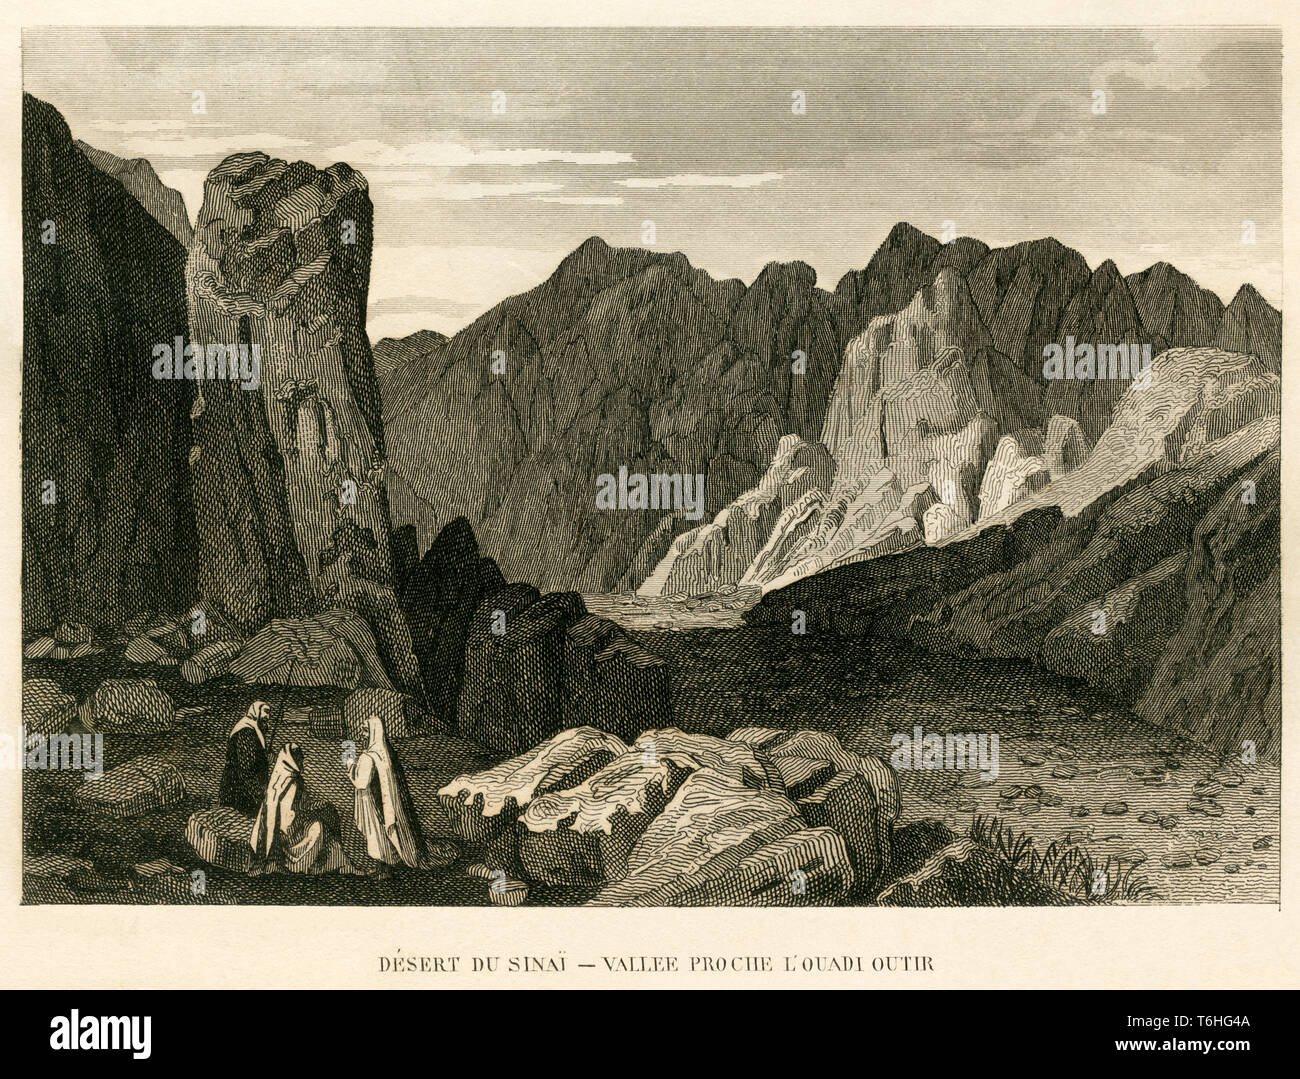 Asien, Ägypten, Sinai Halbinsel, Kupferstich von P. Bellier bei T. Blanchard, 1846  /  Asia, Egypt,Sinai Peninsula, copperplate engraving  by P. Belli Stock Photo